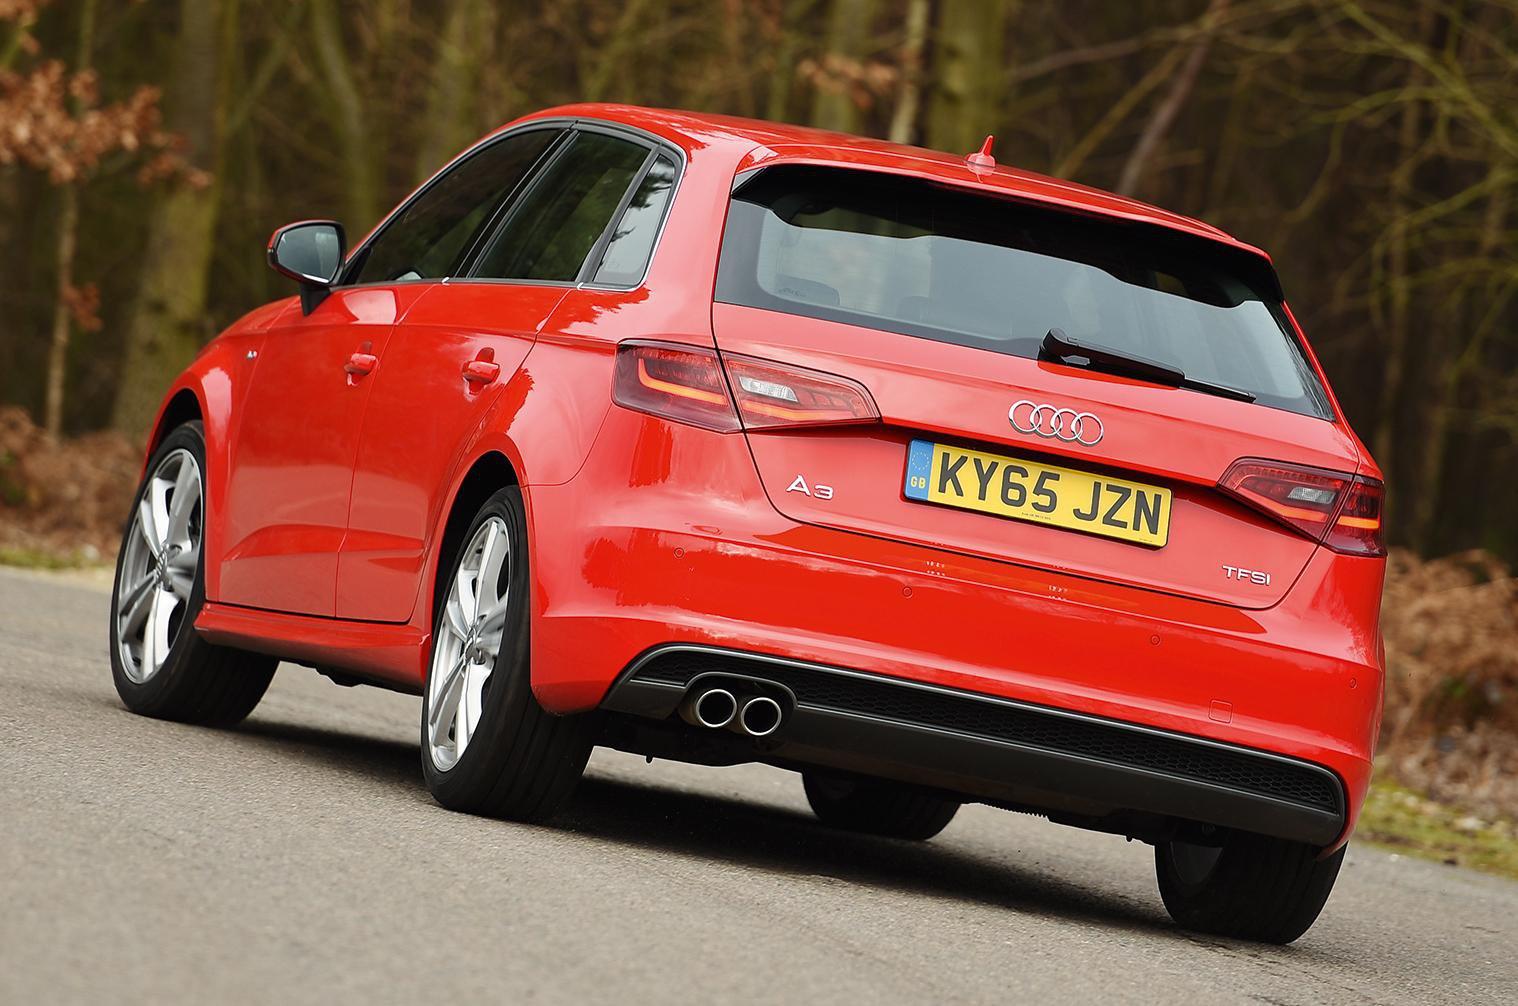 Audi A3 Sportback vs BMW 1 Series vs Infiniti Q30